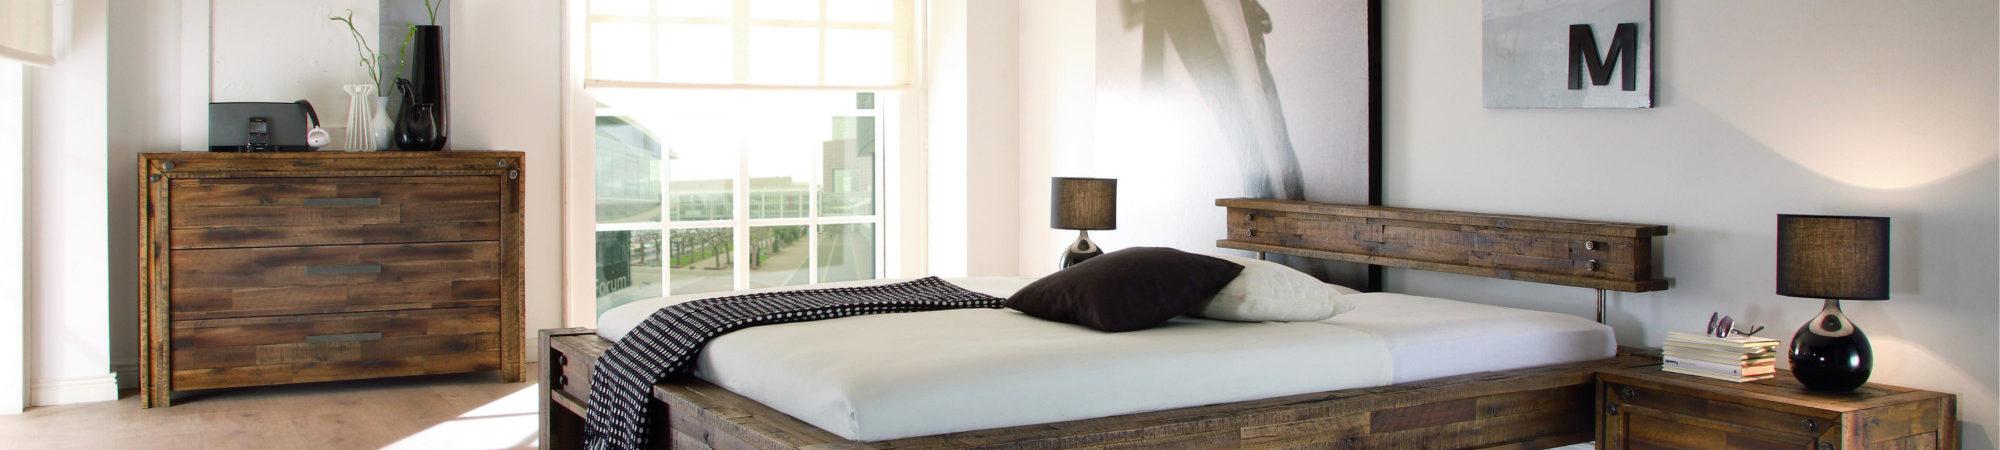 Full Size of Benker Betten Ihr Zertifiziertes Bettenhaus Auf 3 Etagen In Minden Bett Betten.de